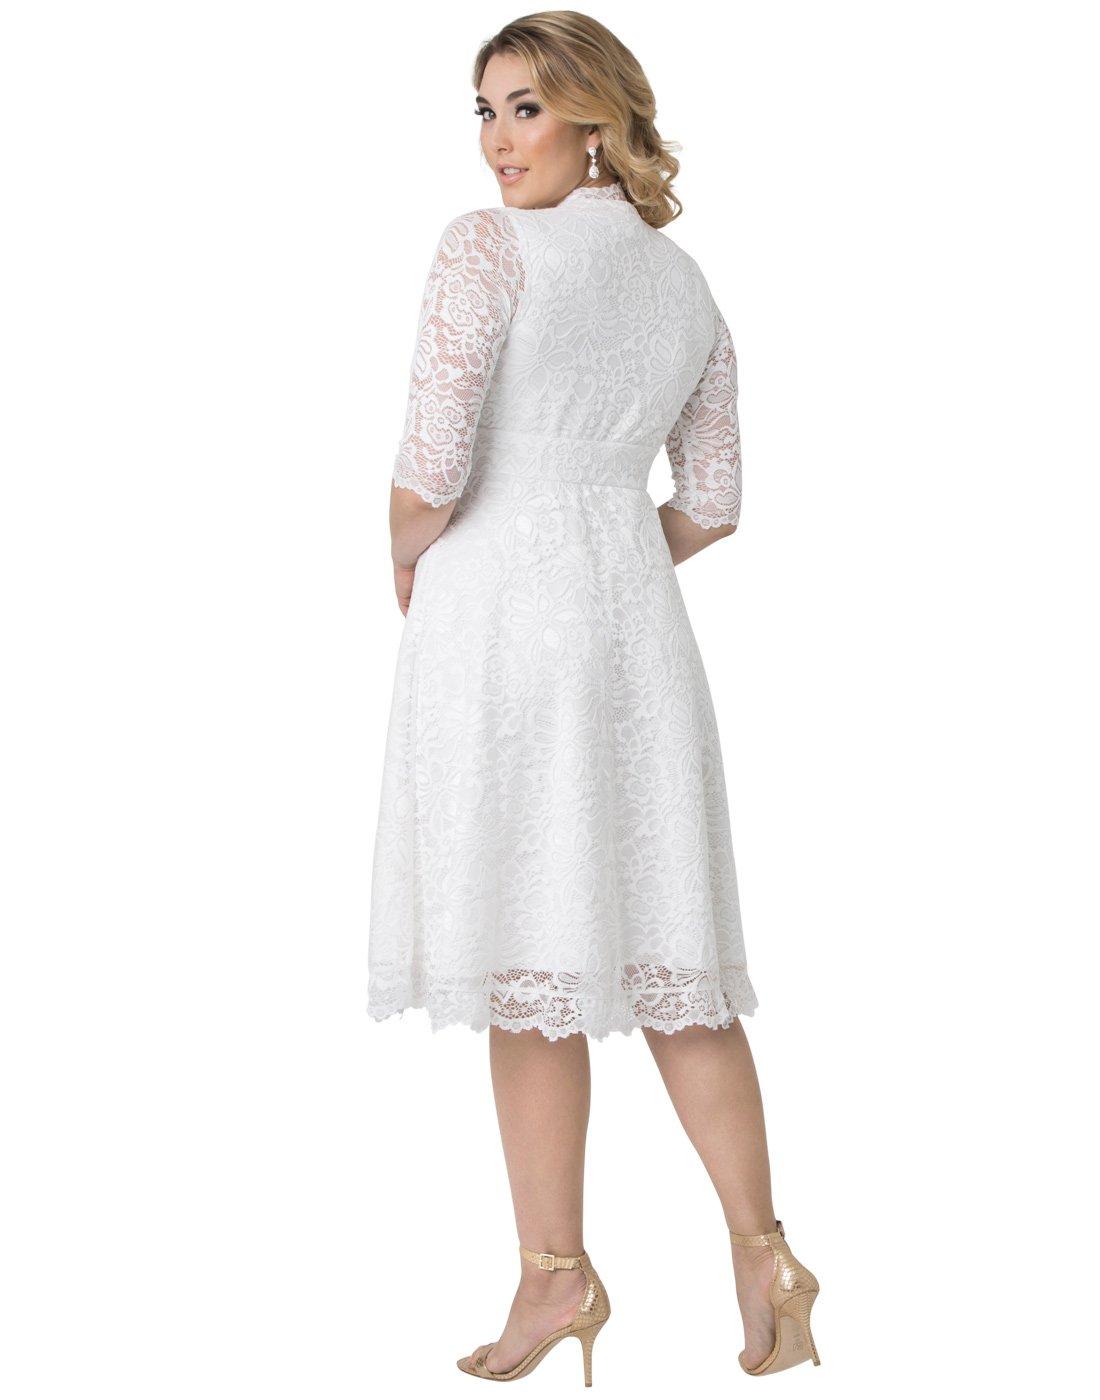 e19585db0cfdf Kiyonna Women s Plus Size Wedding Belle Dress - Top Plus Size Models -  Affordable Plus Size Clothing - Plus Size For Less - Cheap Clothes